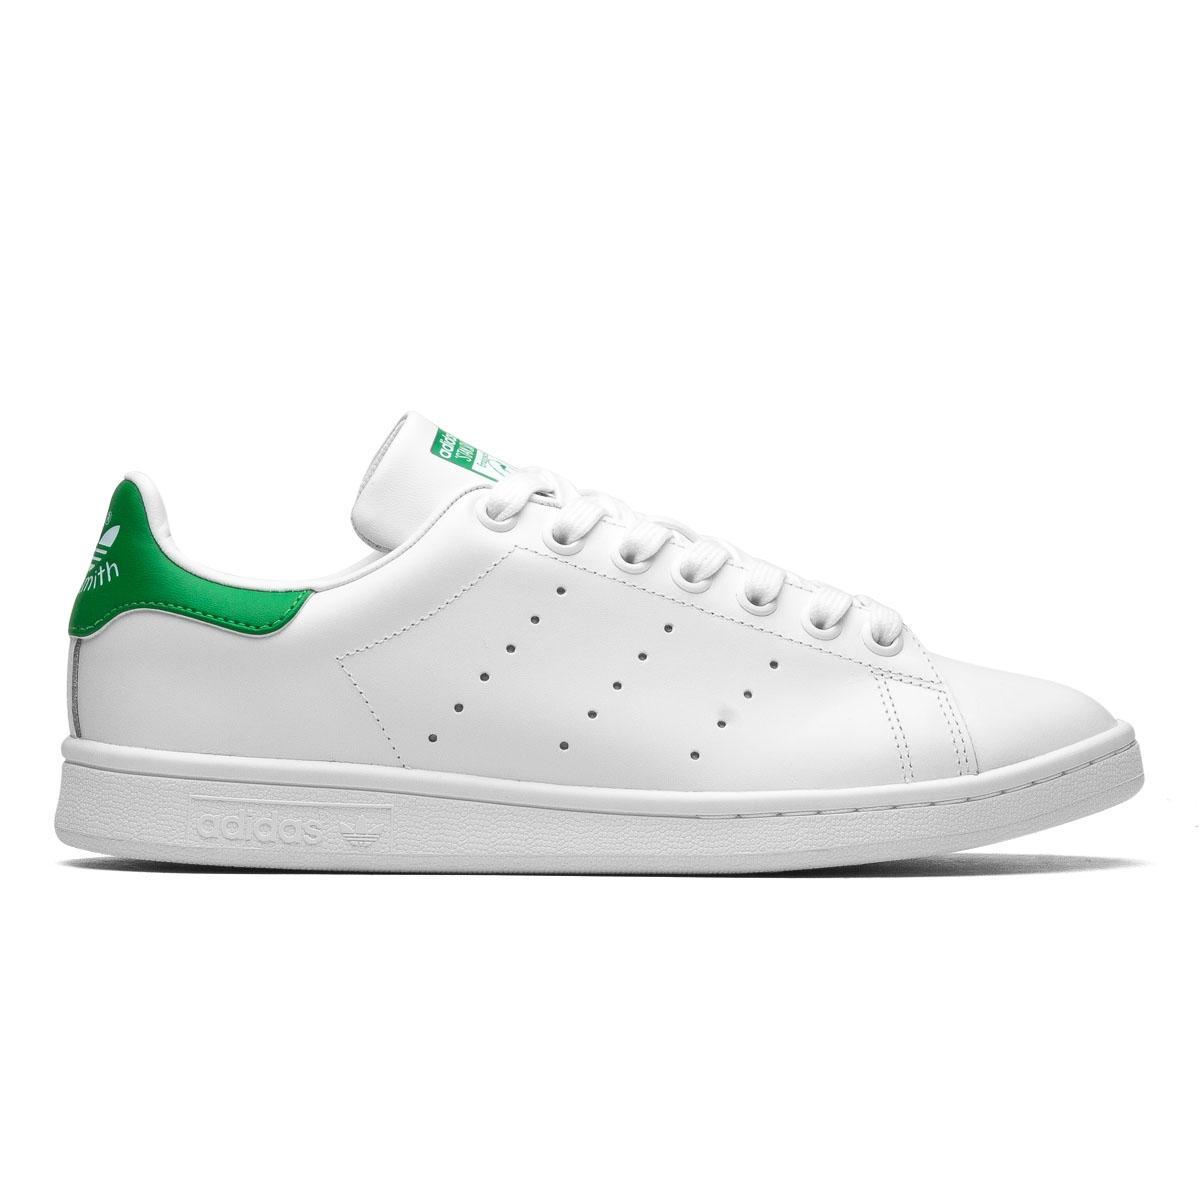 Giày sneaker Adidas Stan smith gót xanh lá nam nữ